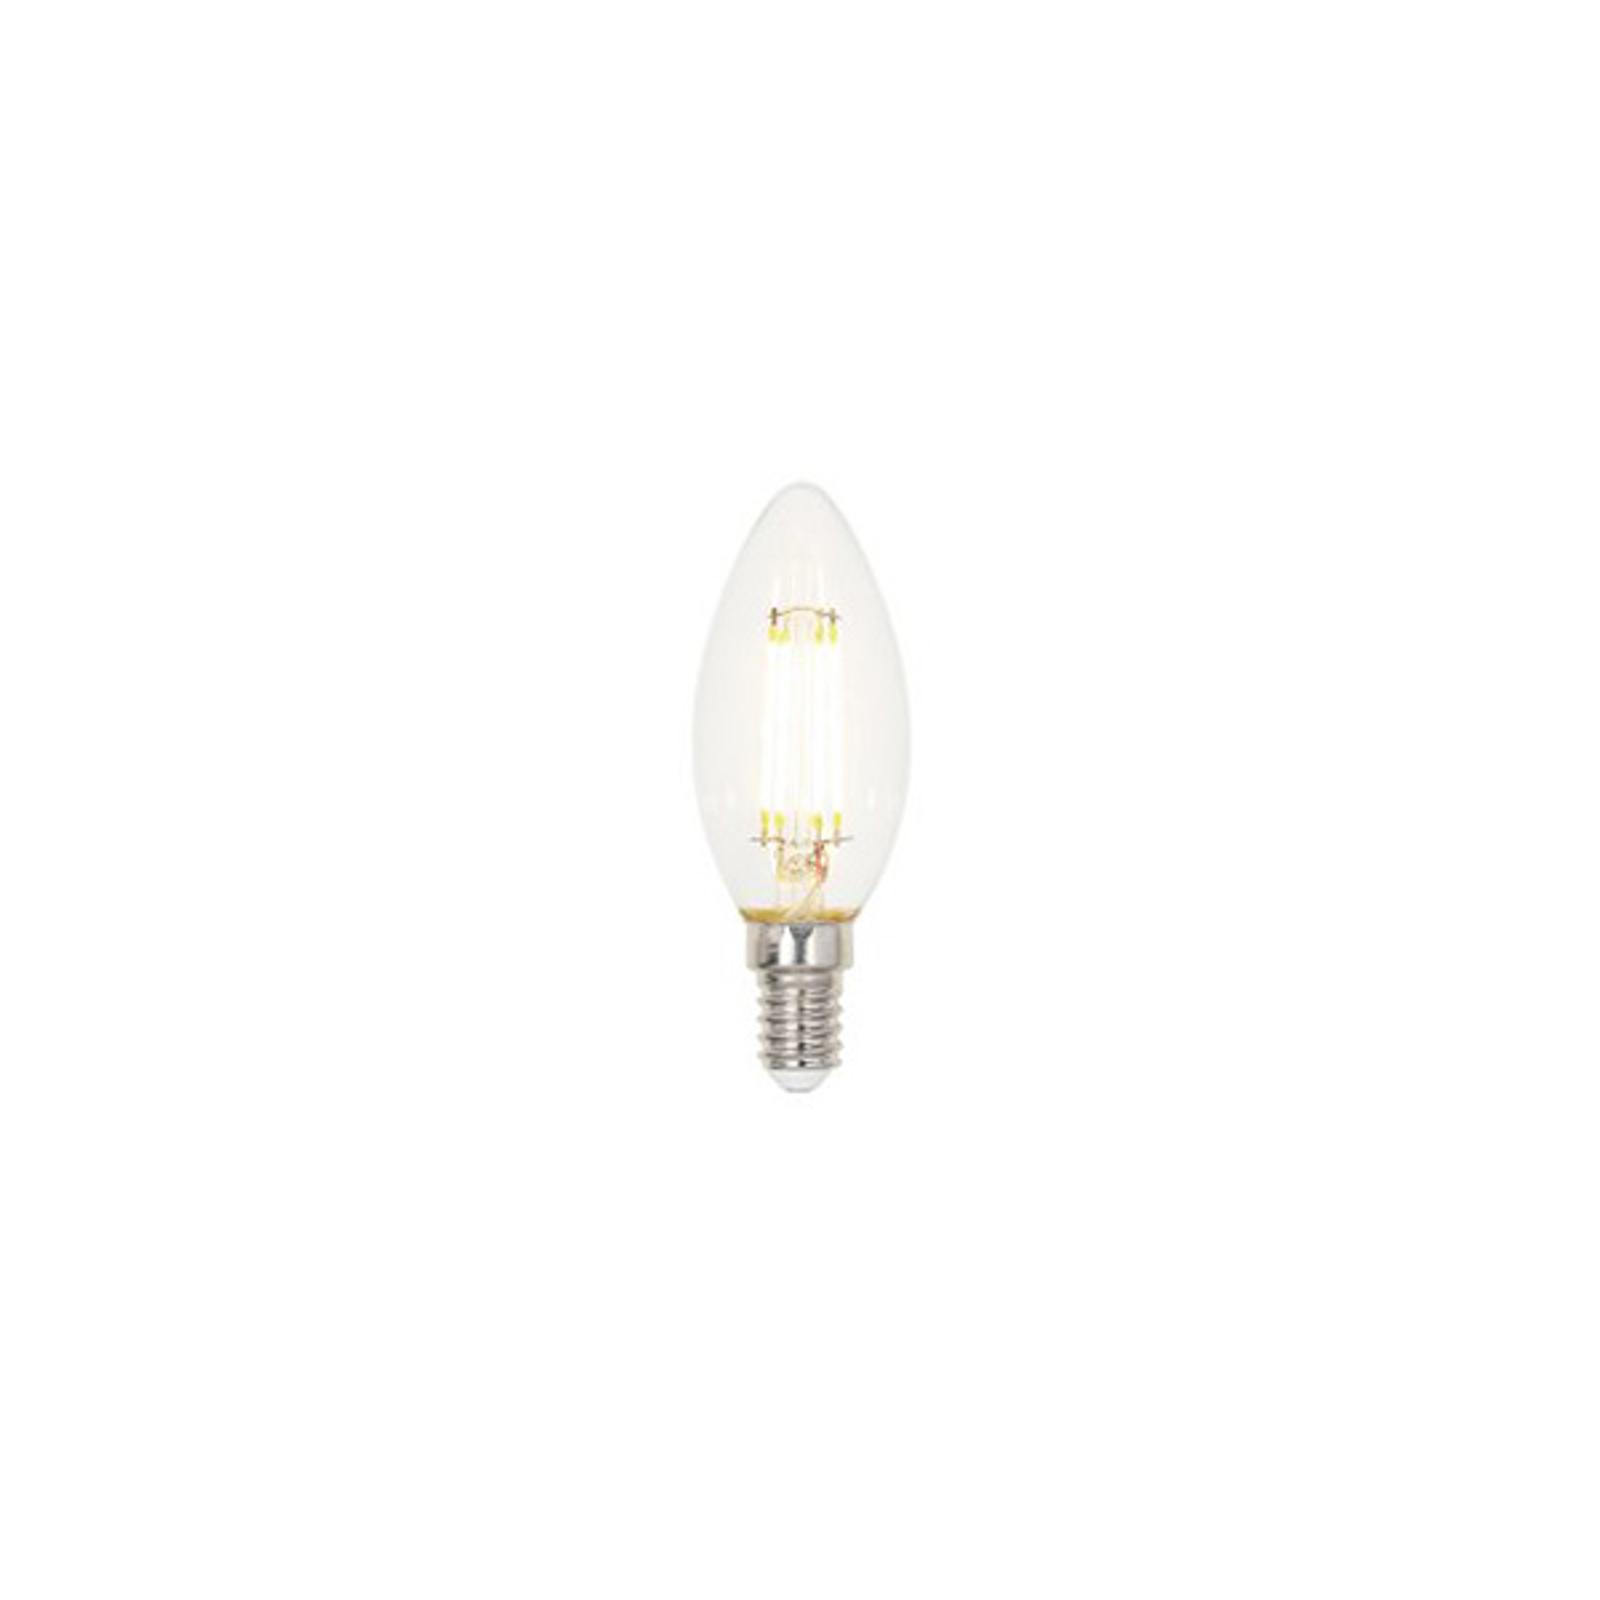 Westinghouse żarówka LED E14 4,5W 2700K